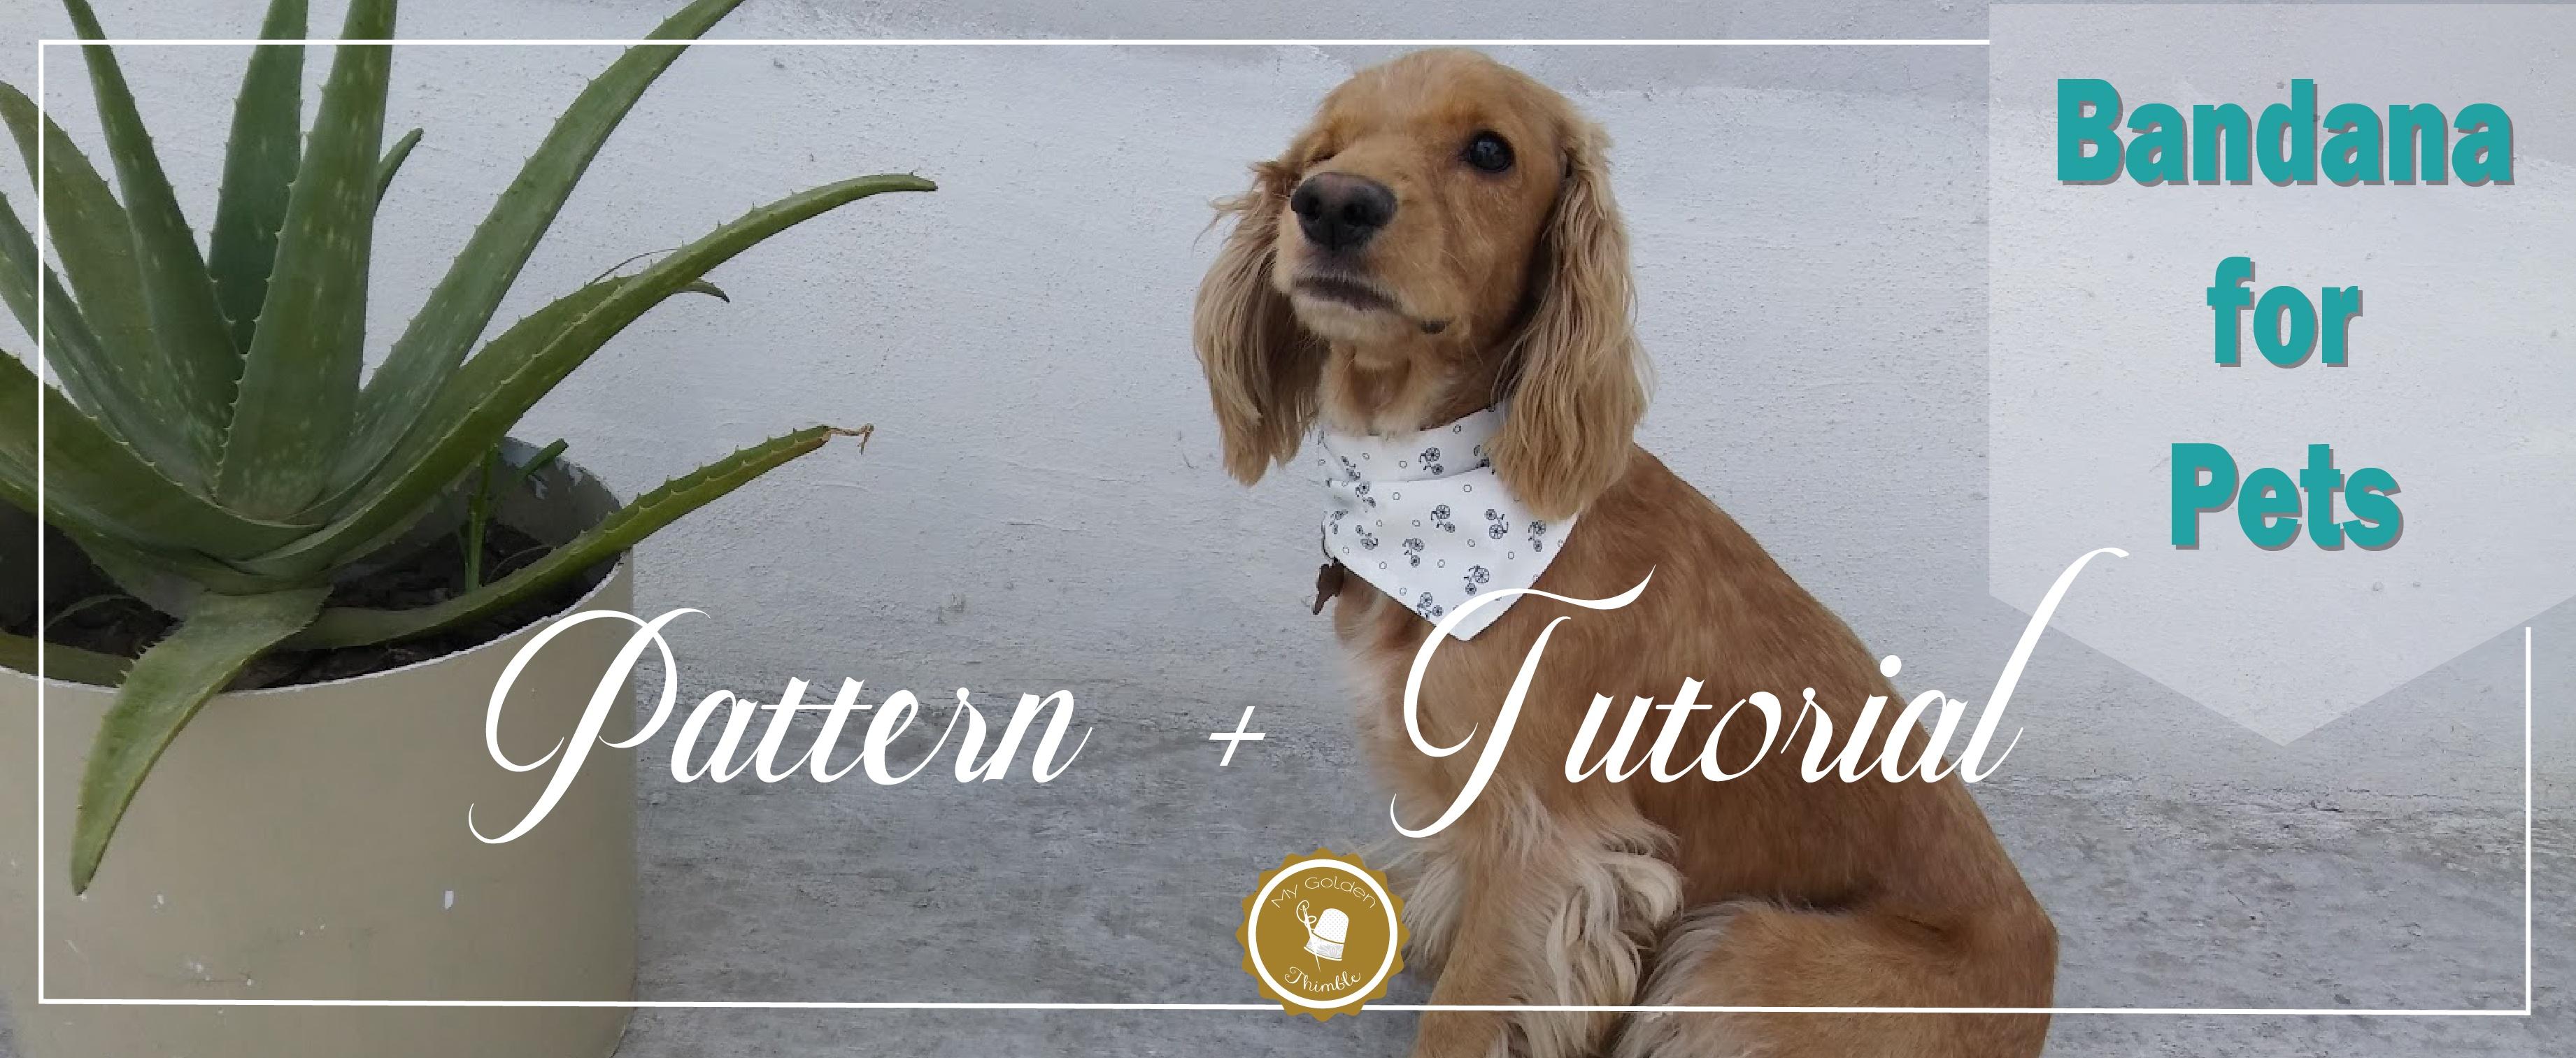 Free Dog Bandana Pattern Diy: For All Sizes! | My Golden Thimble - Dog Sewing Patterns Free Printable